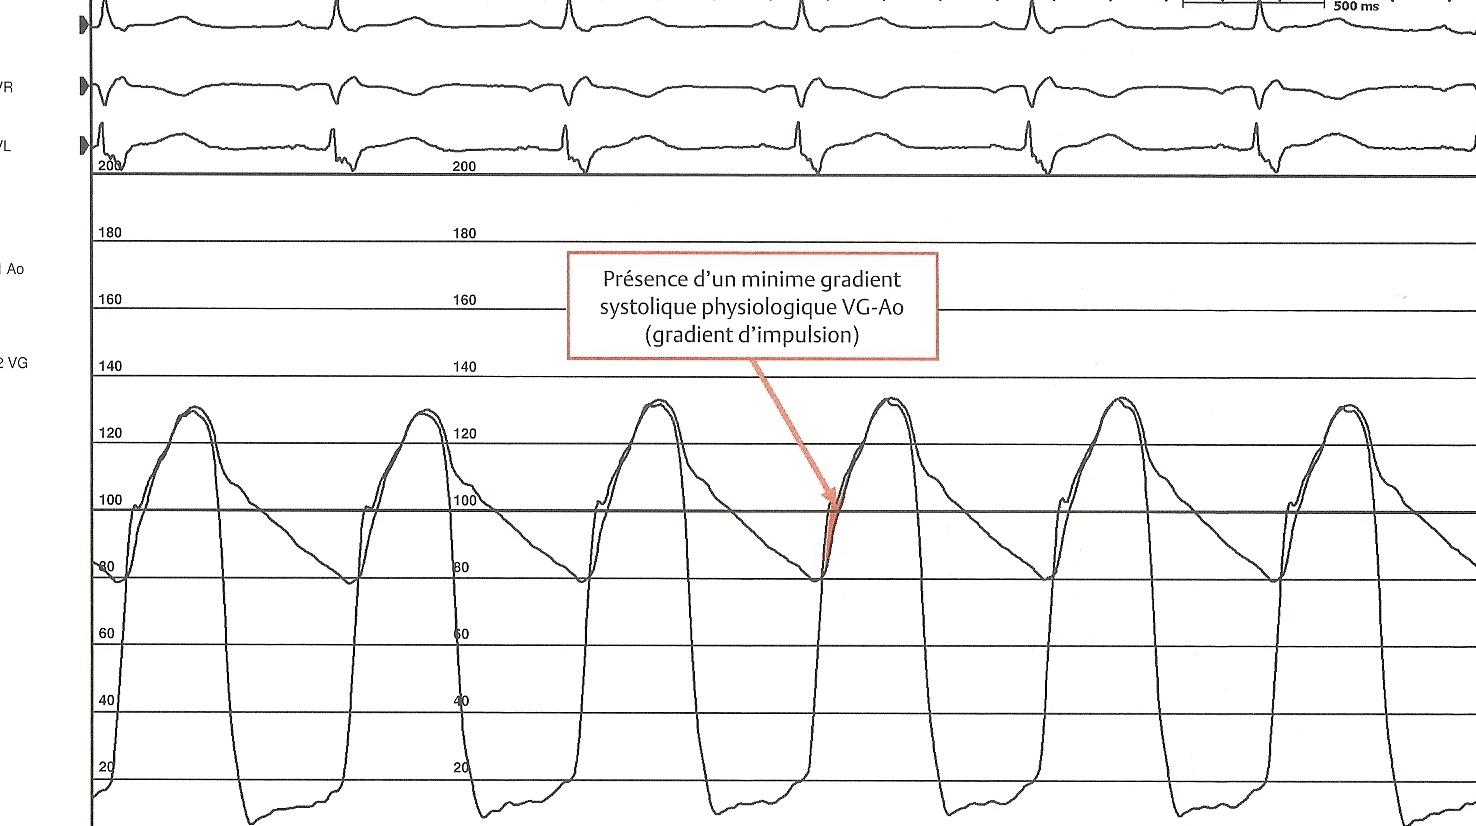 Gradient VG-Aorte